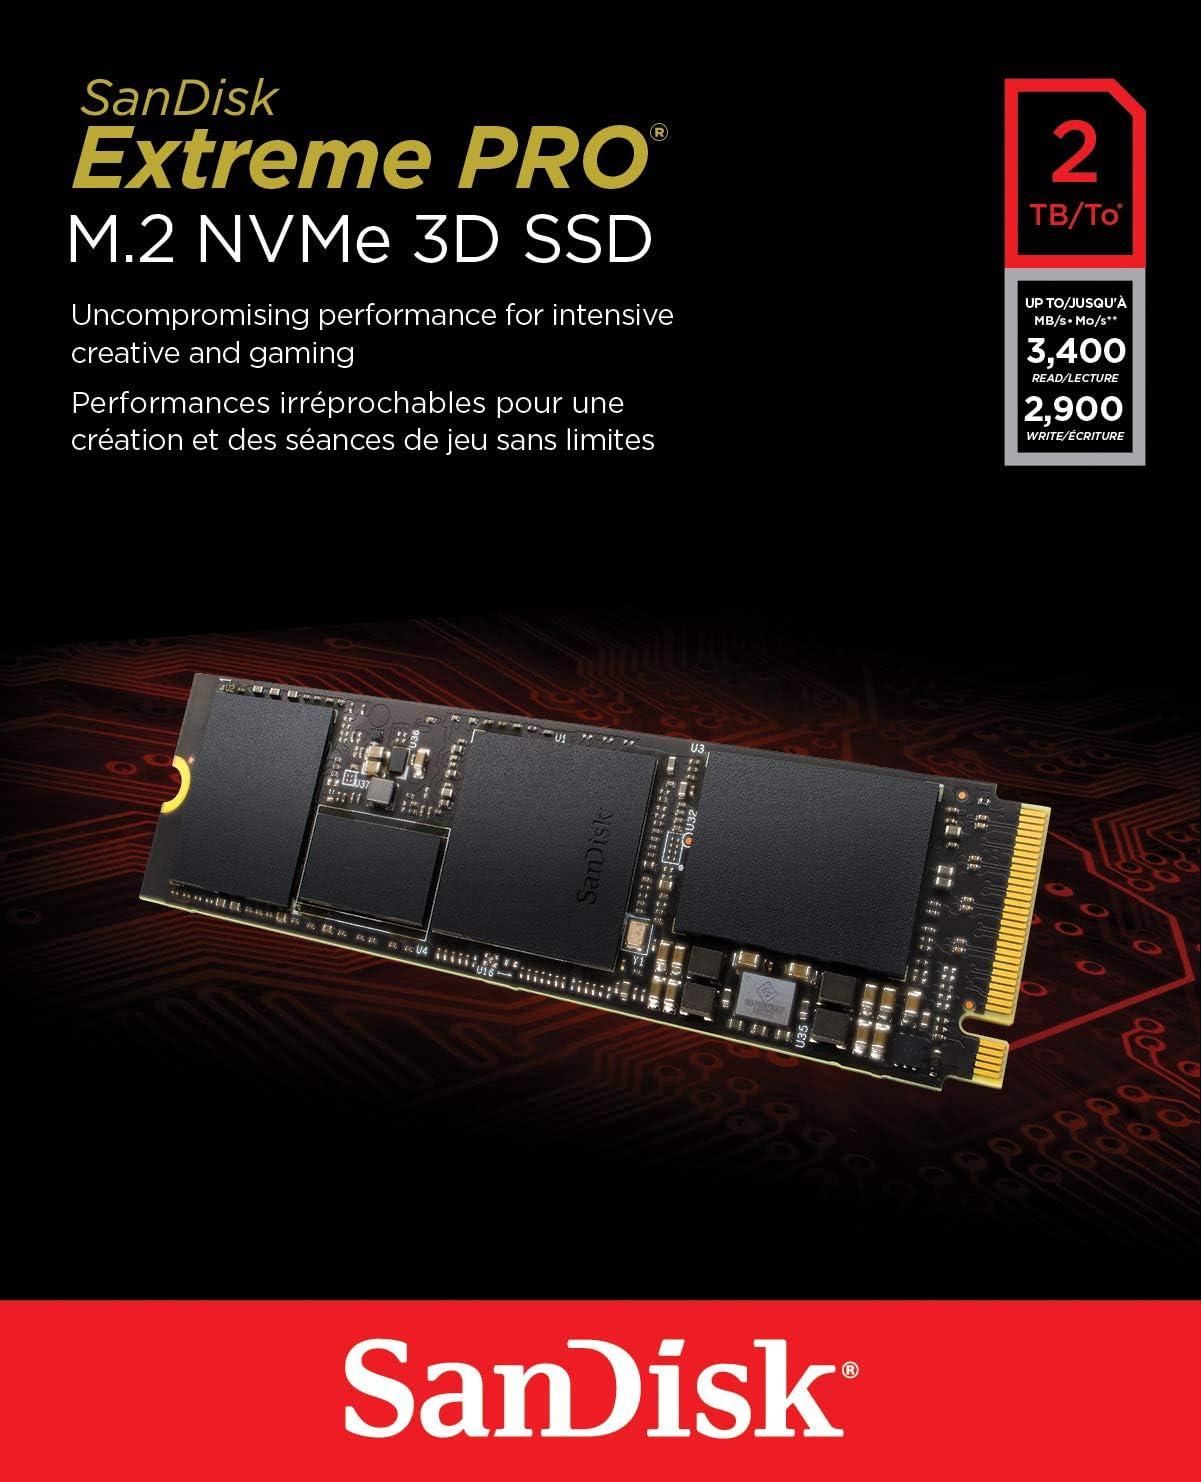 SanDisk Extreme Pro 2TB M.2 NVMe 3D SSD: Amazon.es: Informática